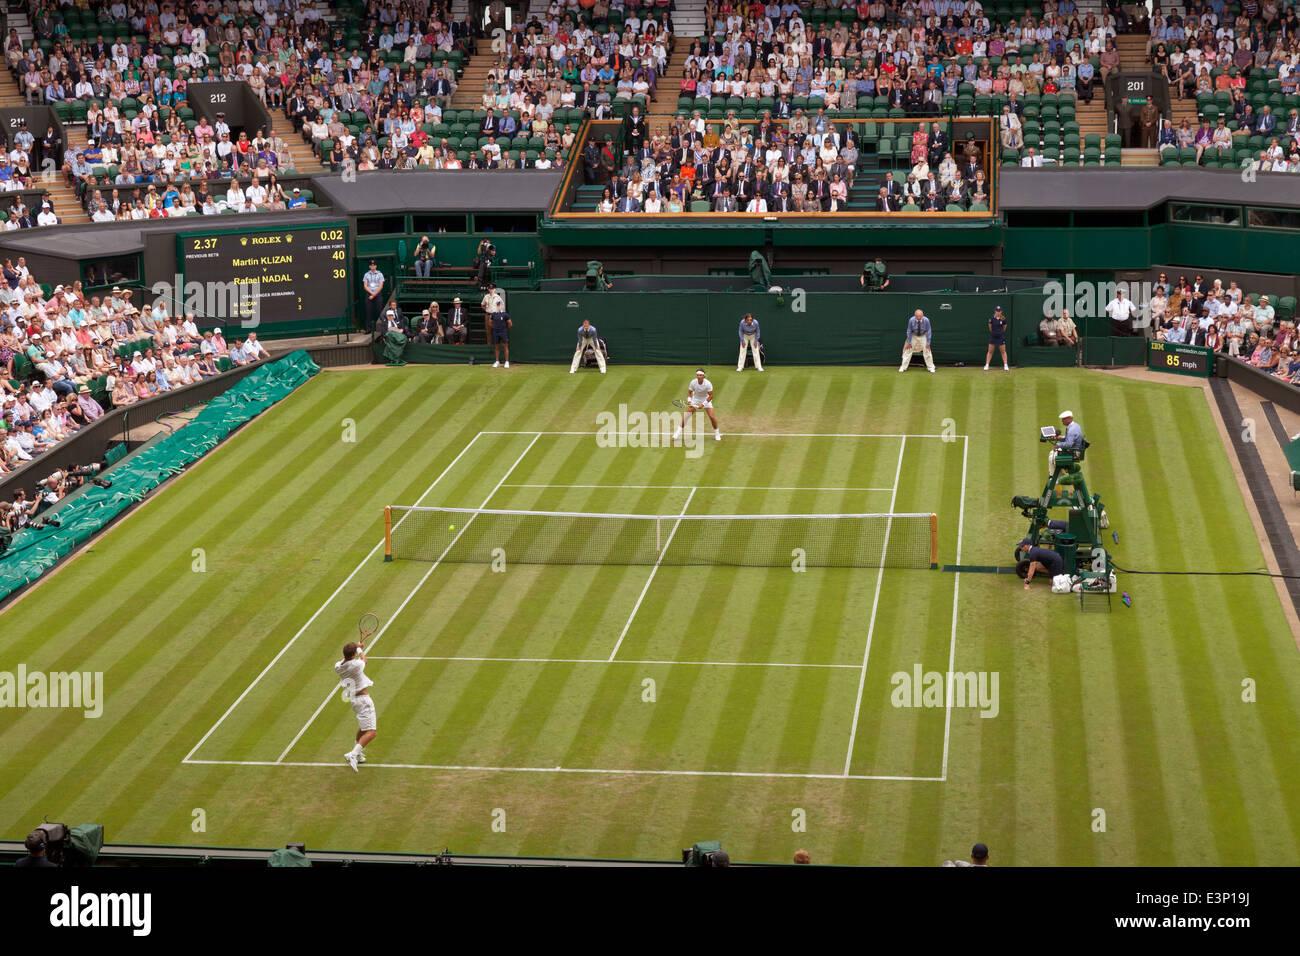 Tenis de Wimbledon - Mens singles tennis match, Campeonato de tenis de Wimbledon 2014, All England Lawn Tennis Club, Imagen De Stock